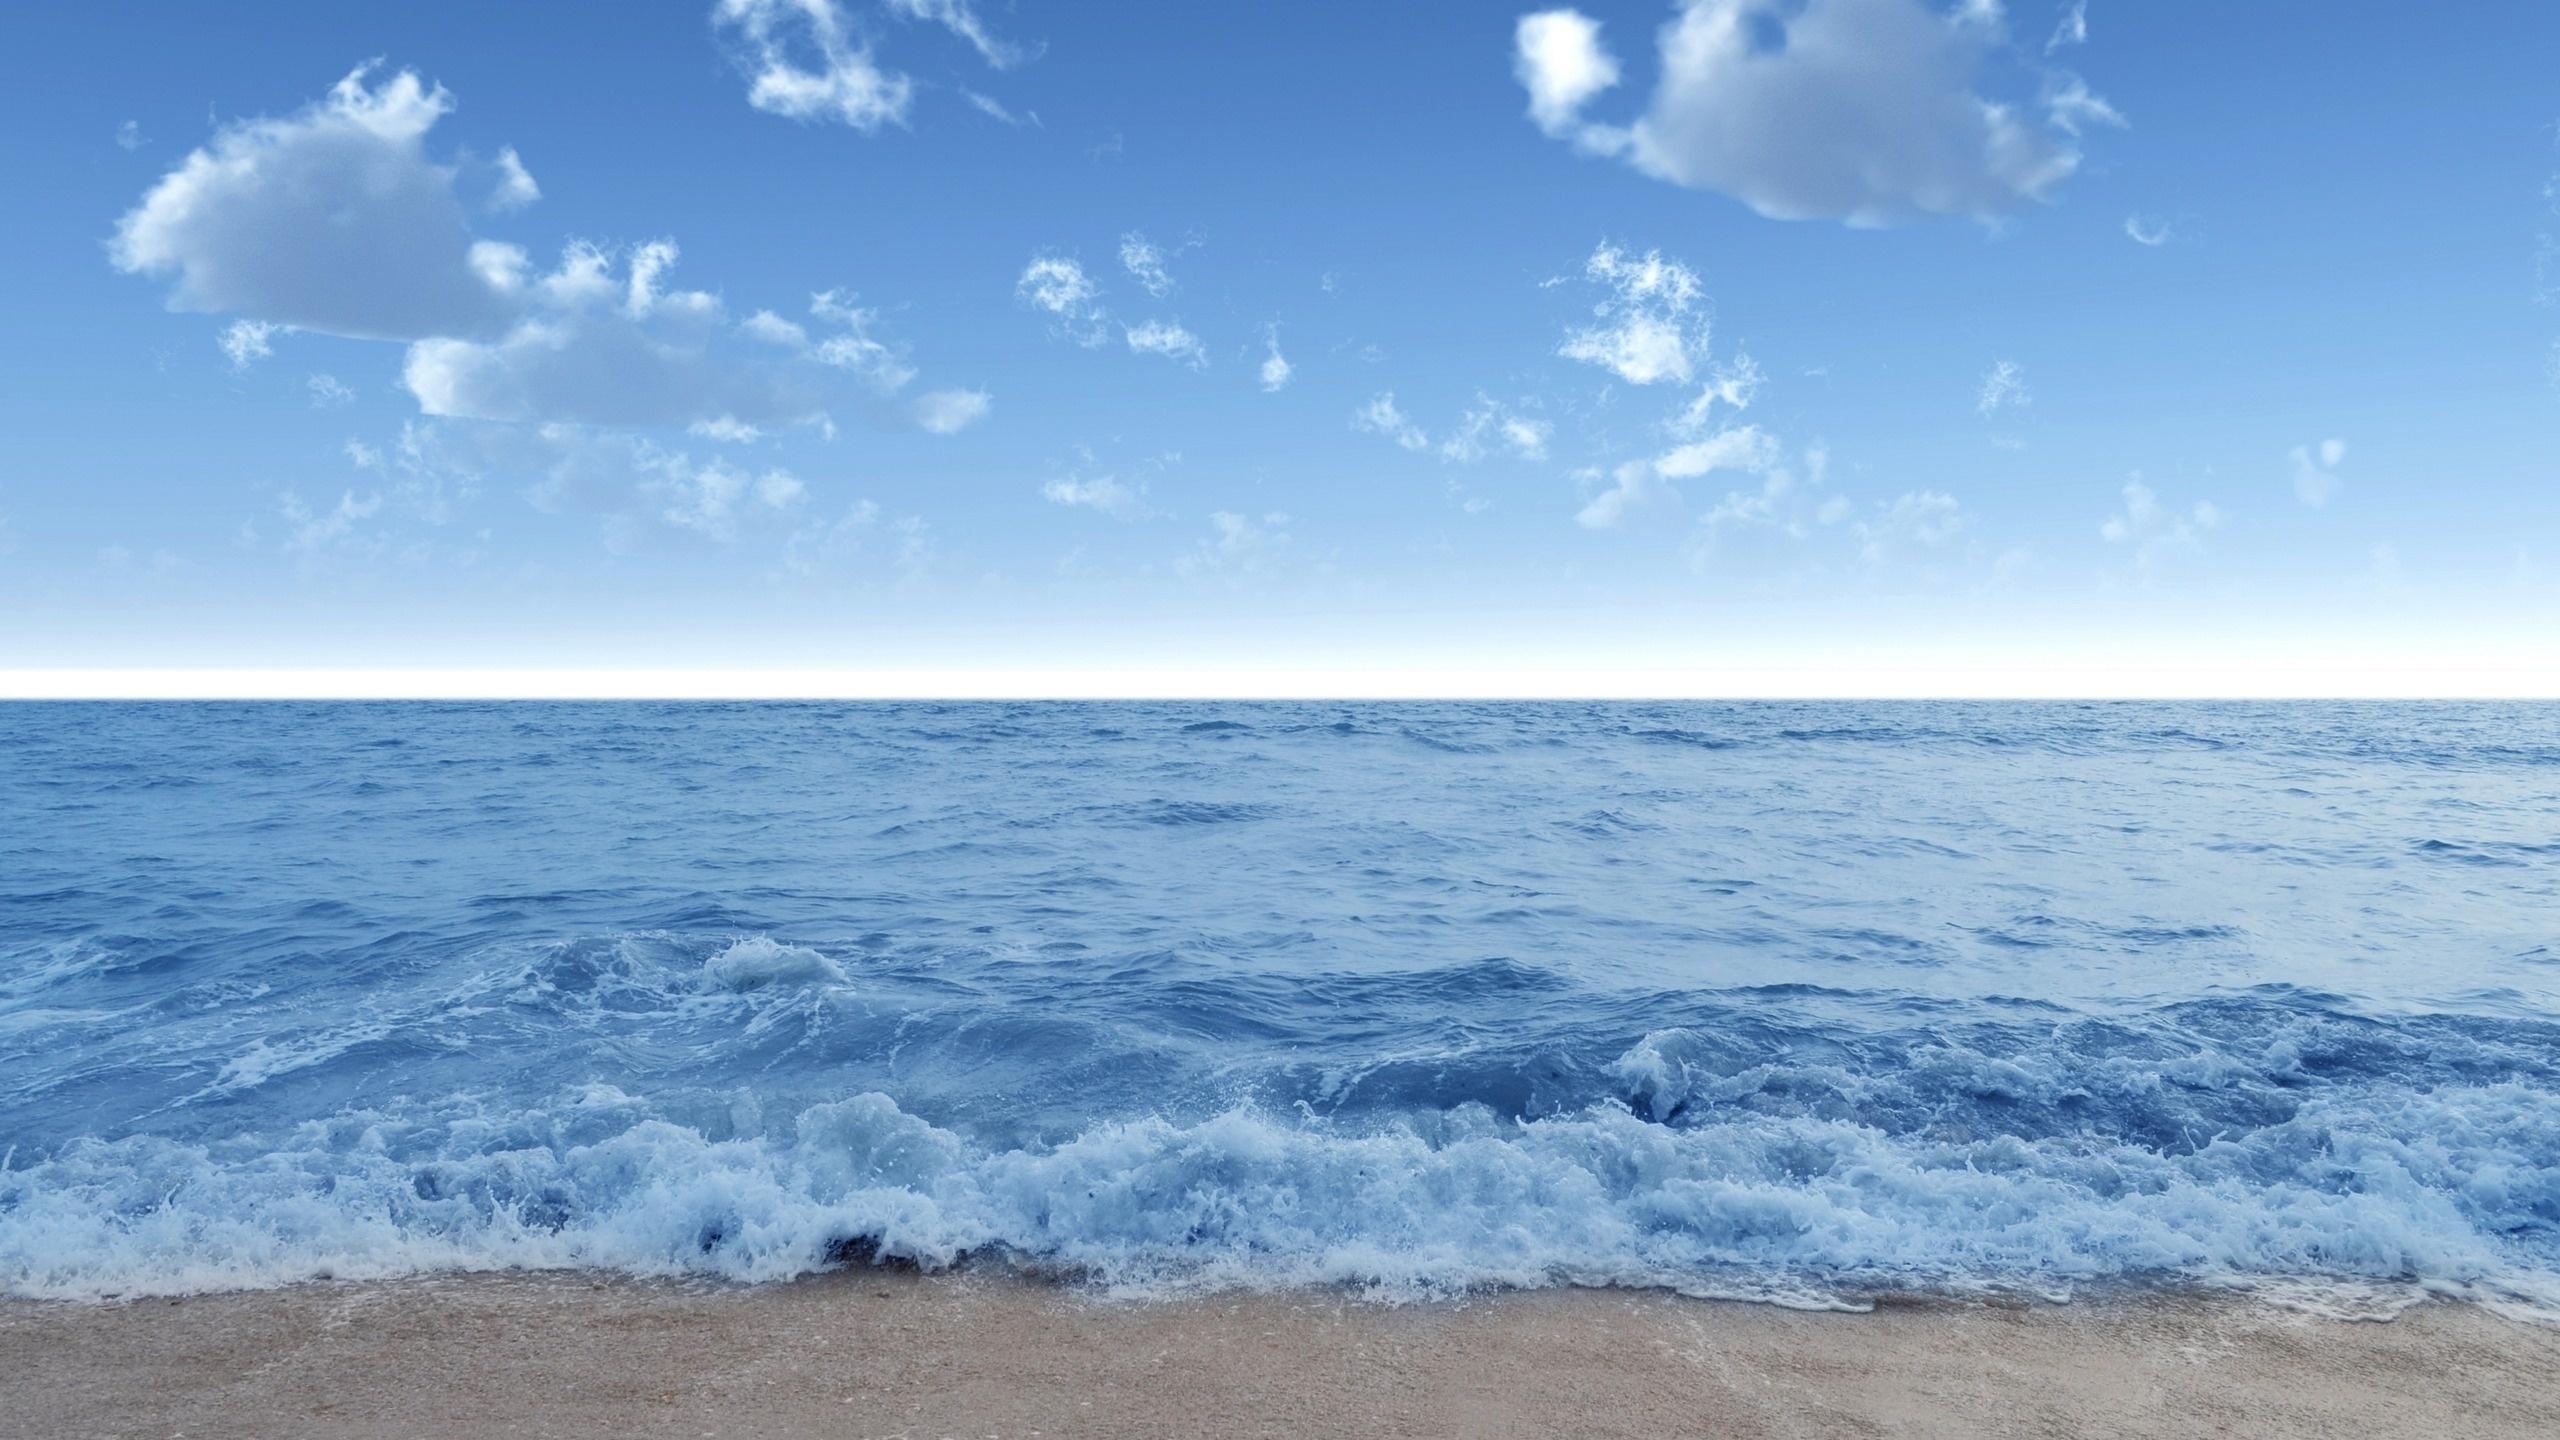 de pantalla del mar, ola, ola, agua, costa, playa, arena, cielo, azul